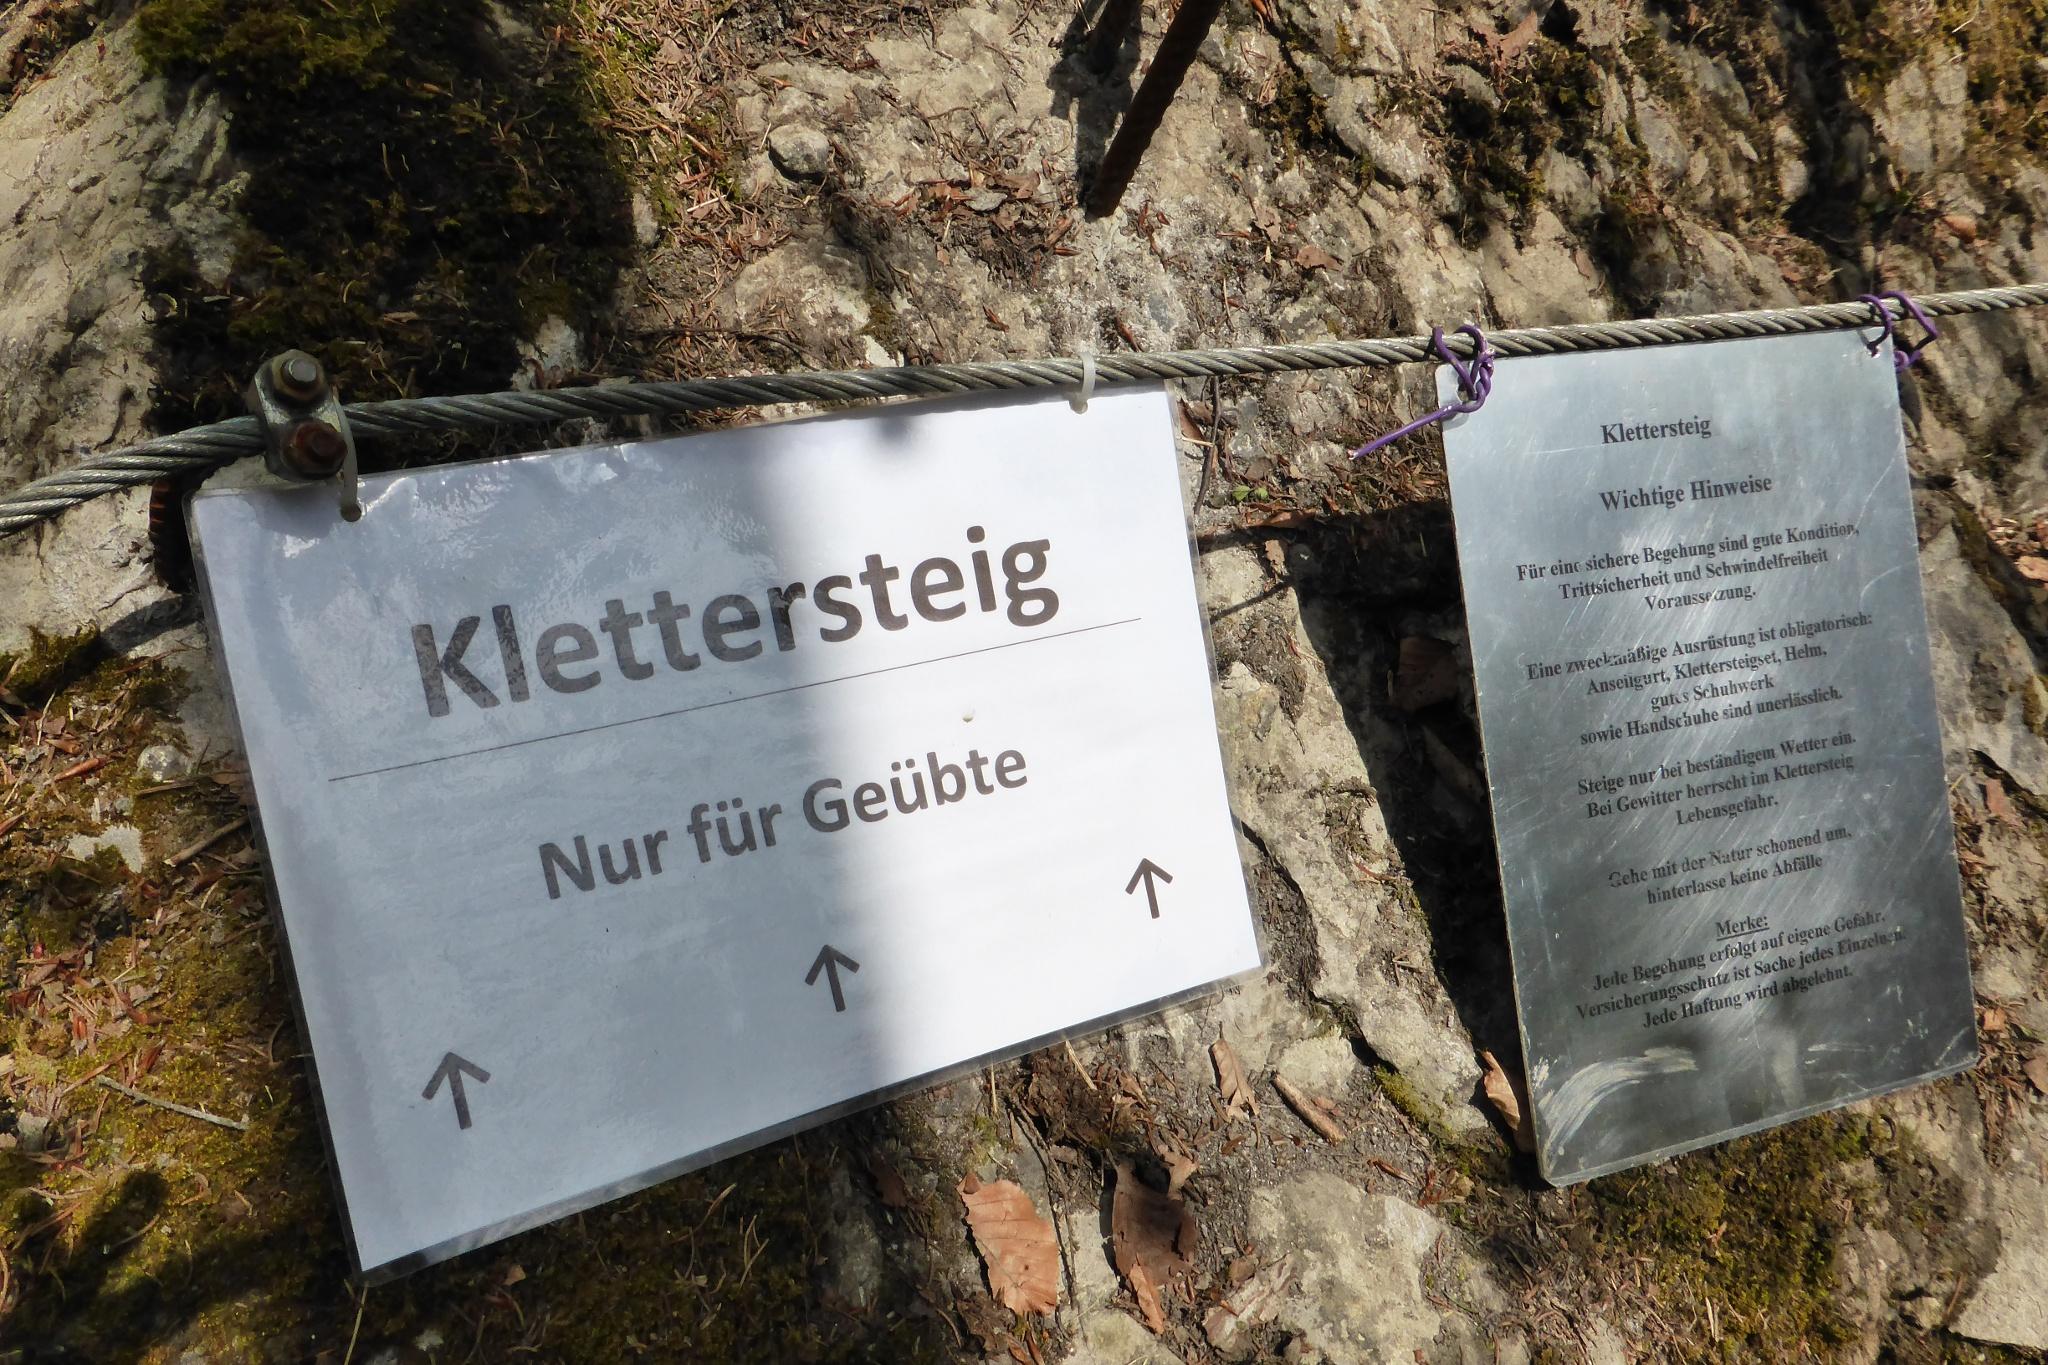 Klettersteig Handschuhe : Bergfex klettersteig obergurgl zirbenwald tour tirol